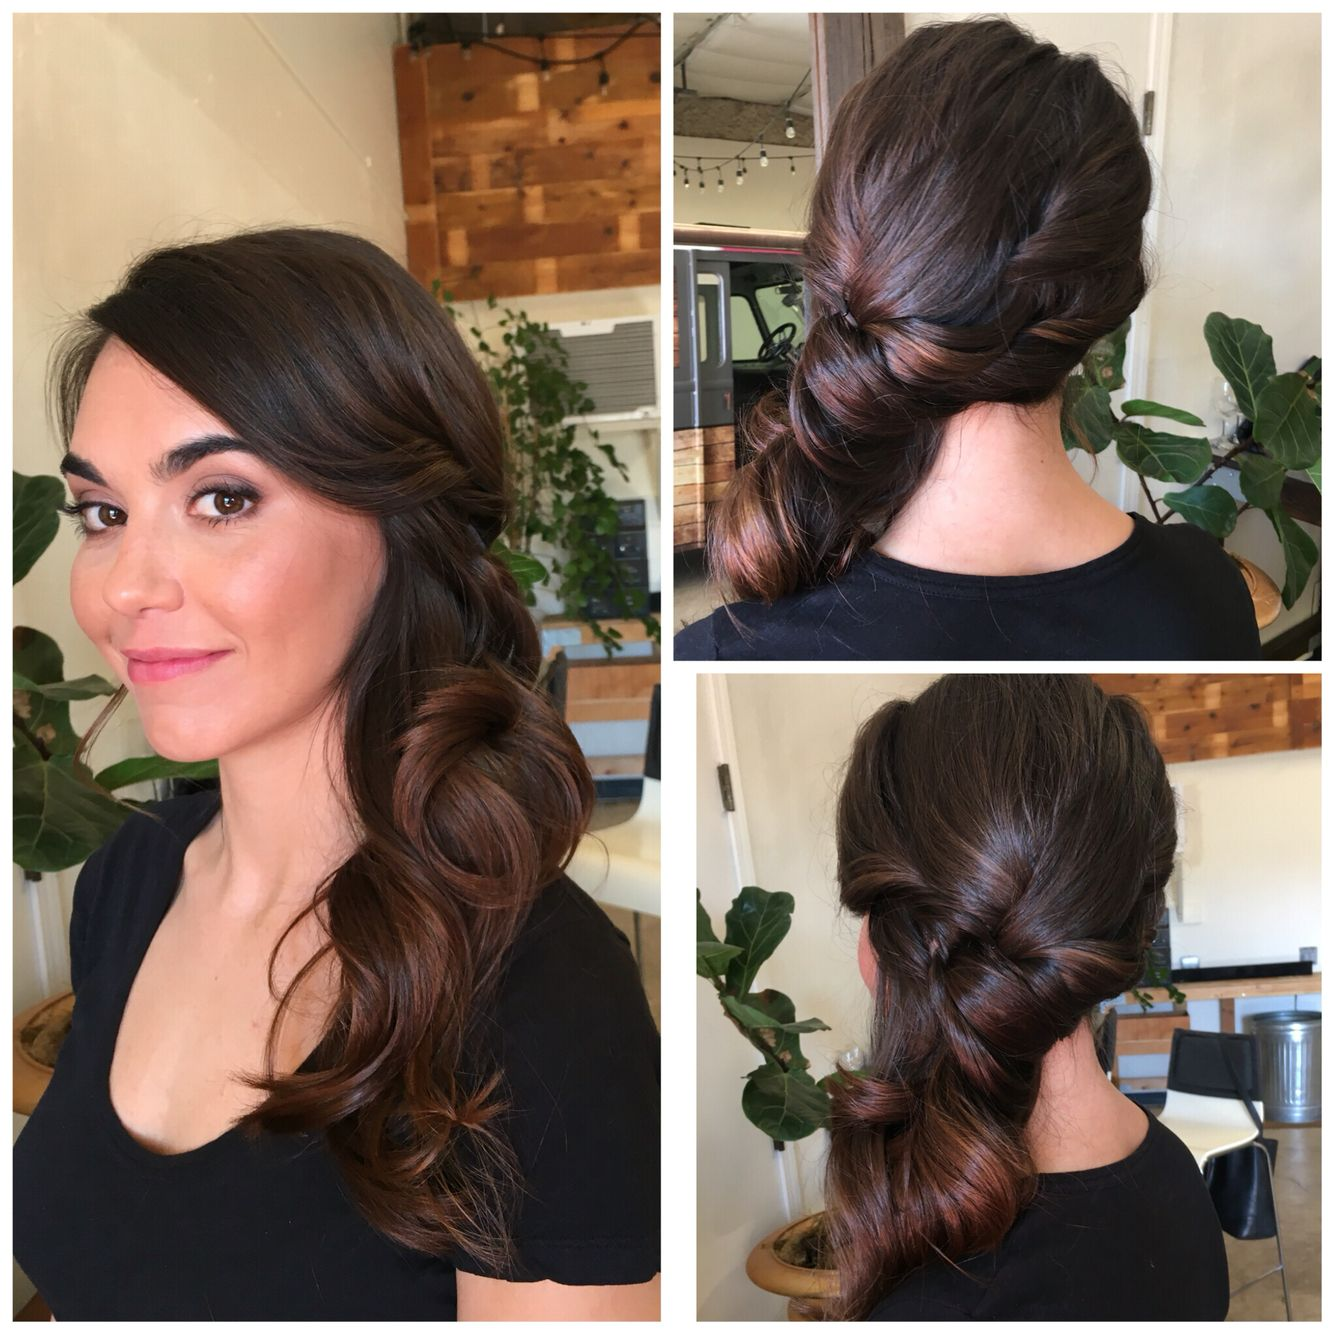 Hairstyles bridesmaids side curls